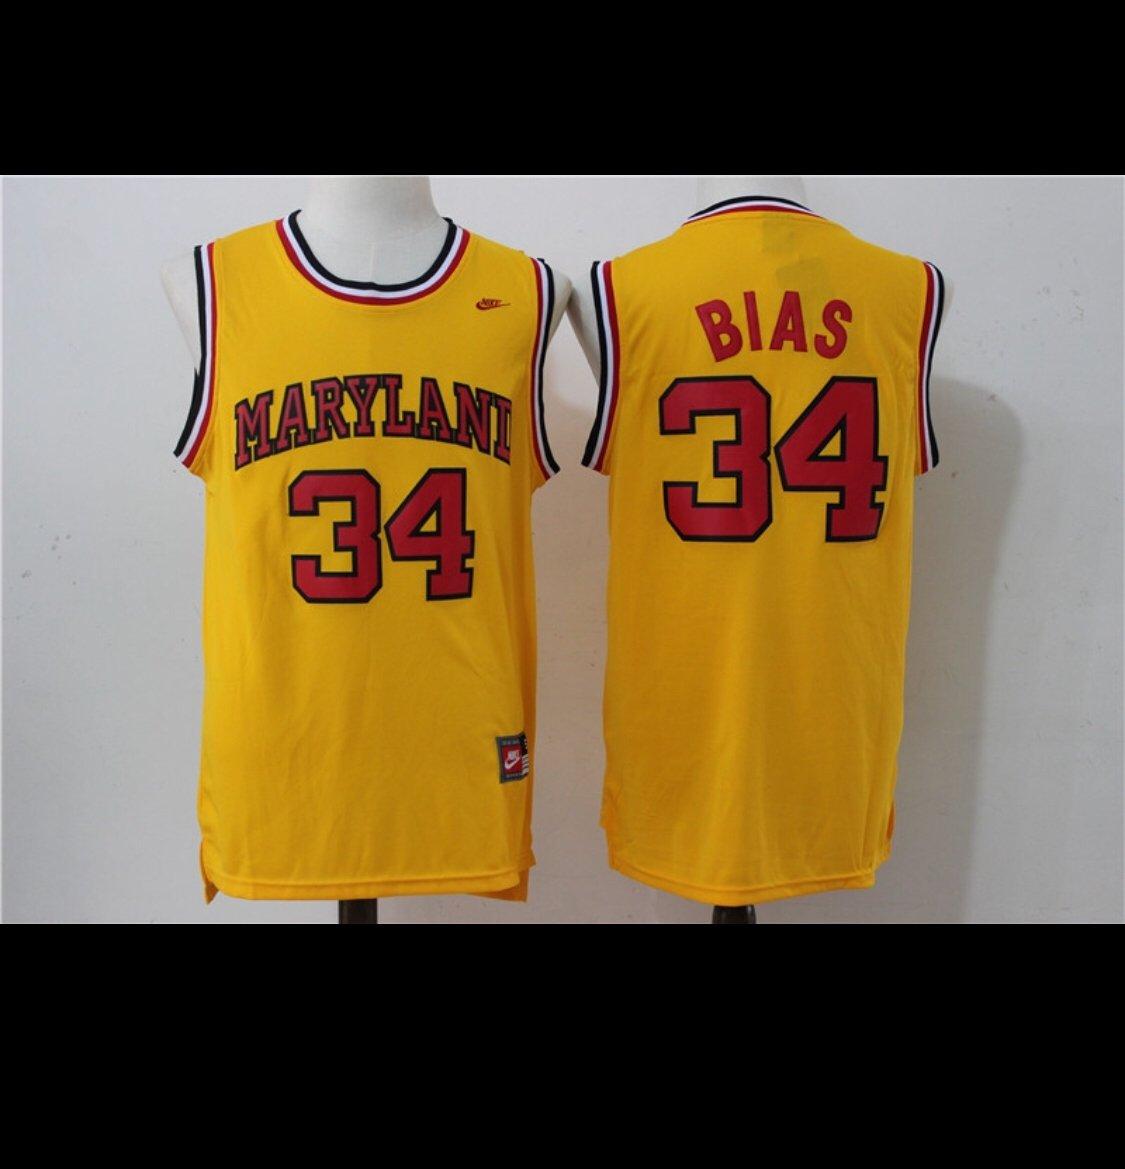 9ef5a8087 Prime Jerseys — Len bias Maryland jersey